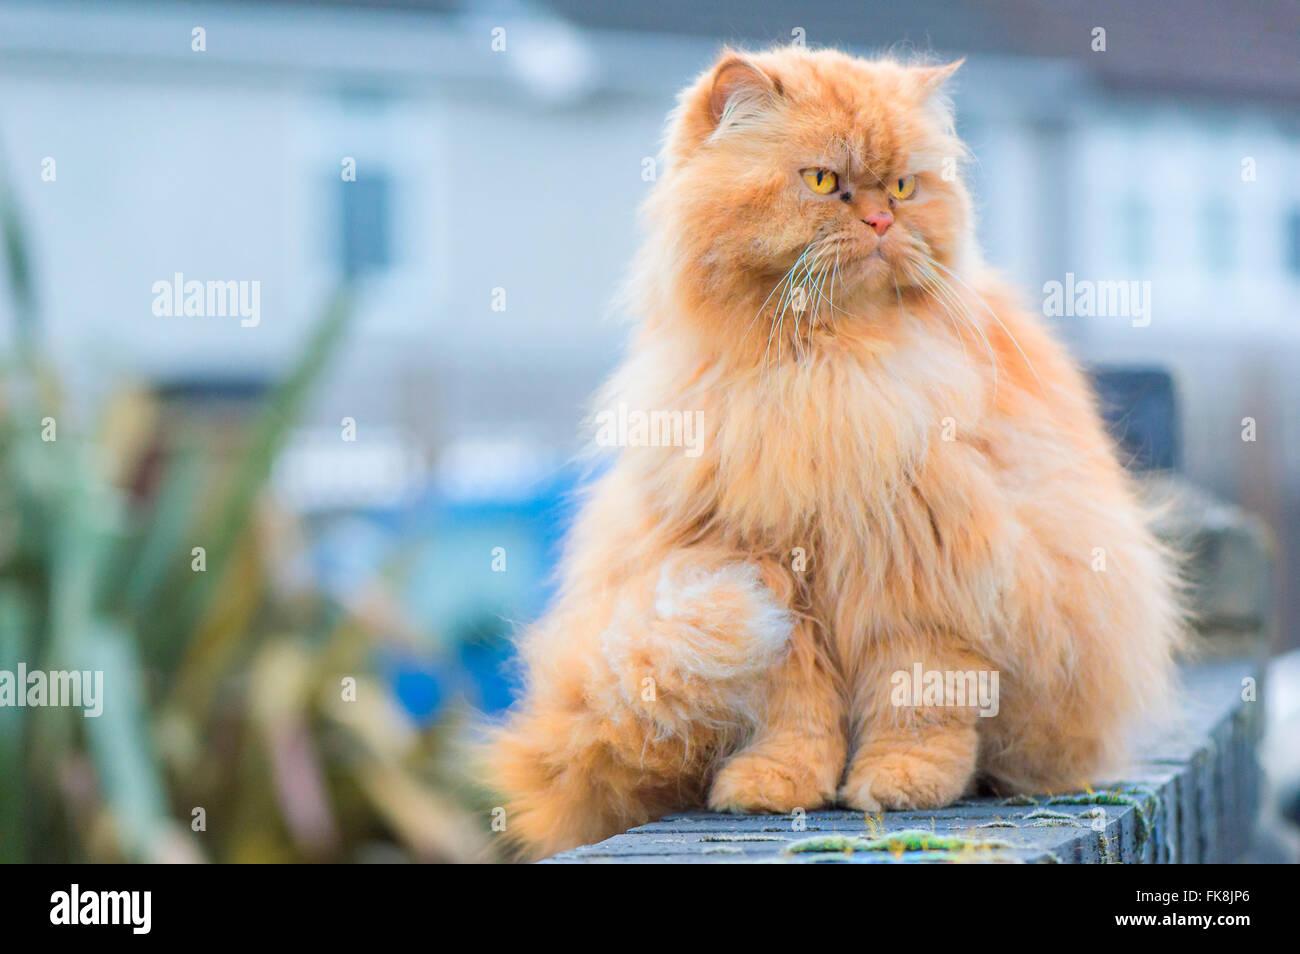 Grumpy Cat - Stock Image